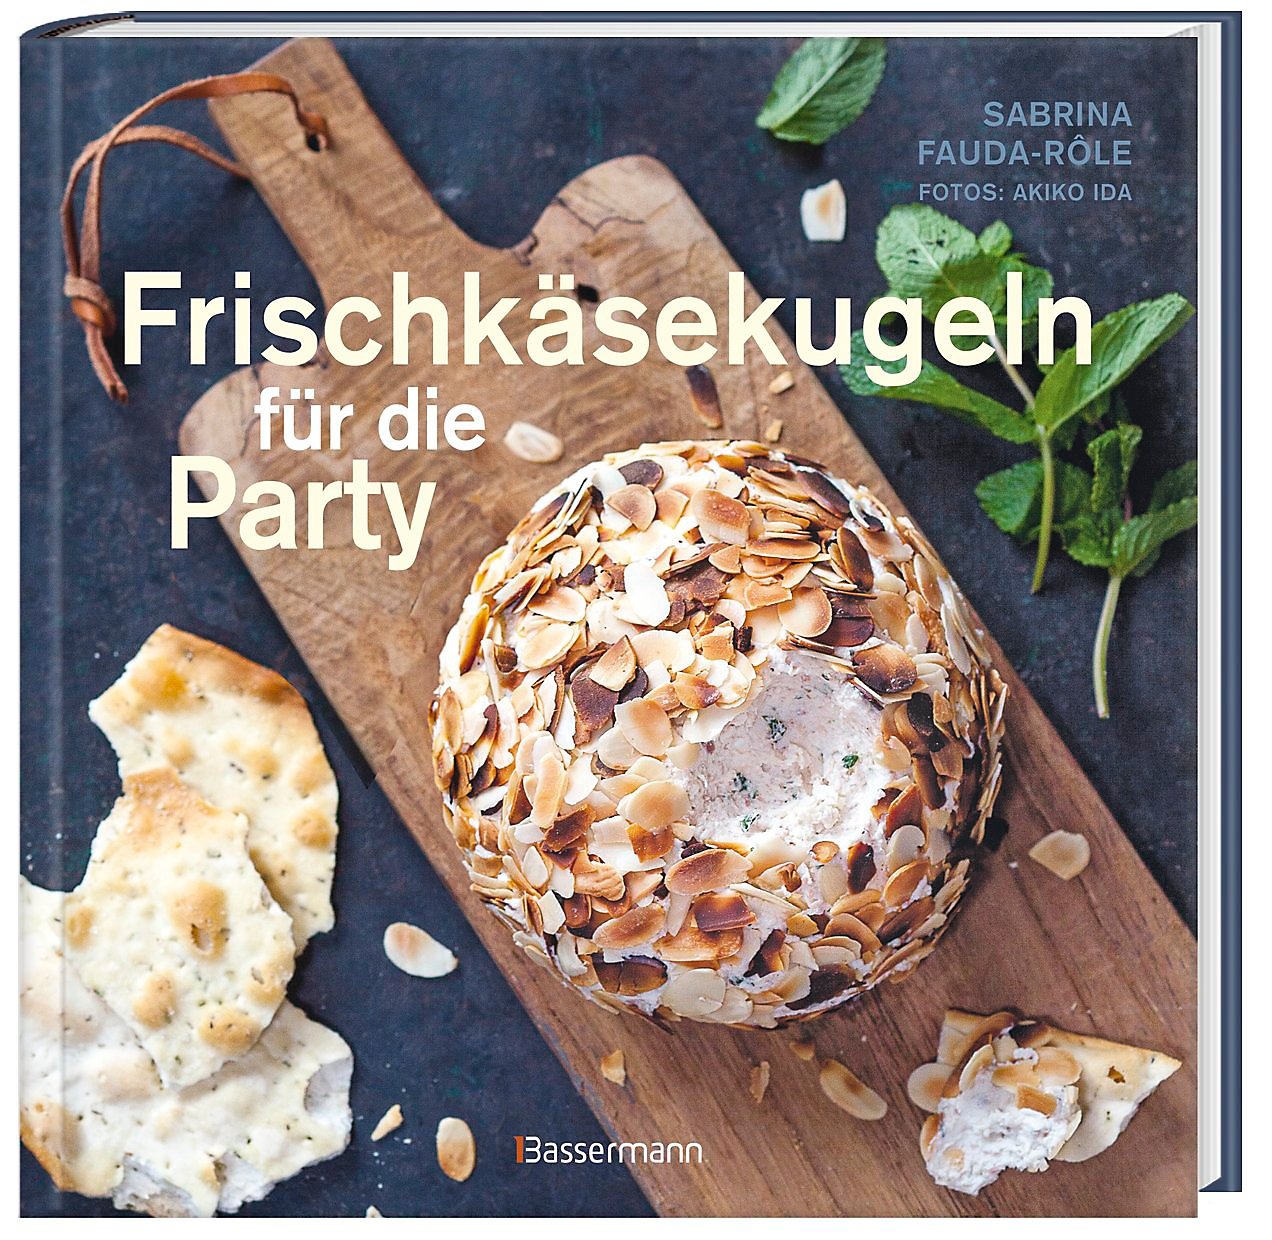 Rütter_Translation_Köln_Frischkäsekugeln für die Party_Bassermann_Verlag_Recipe book_German